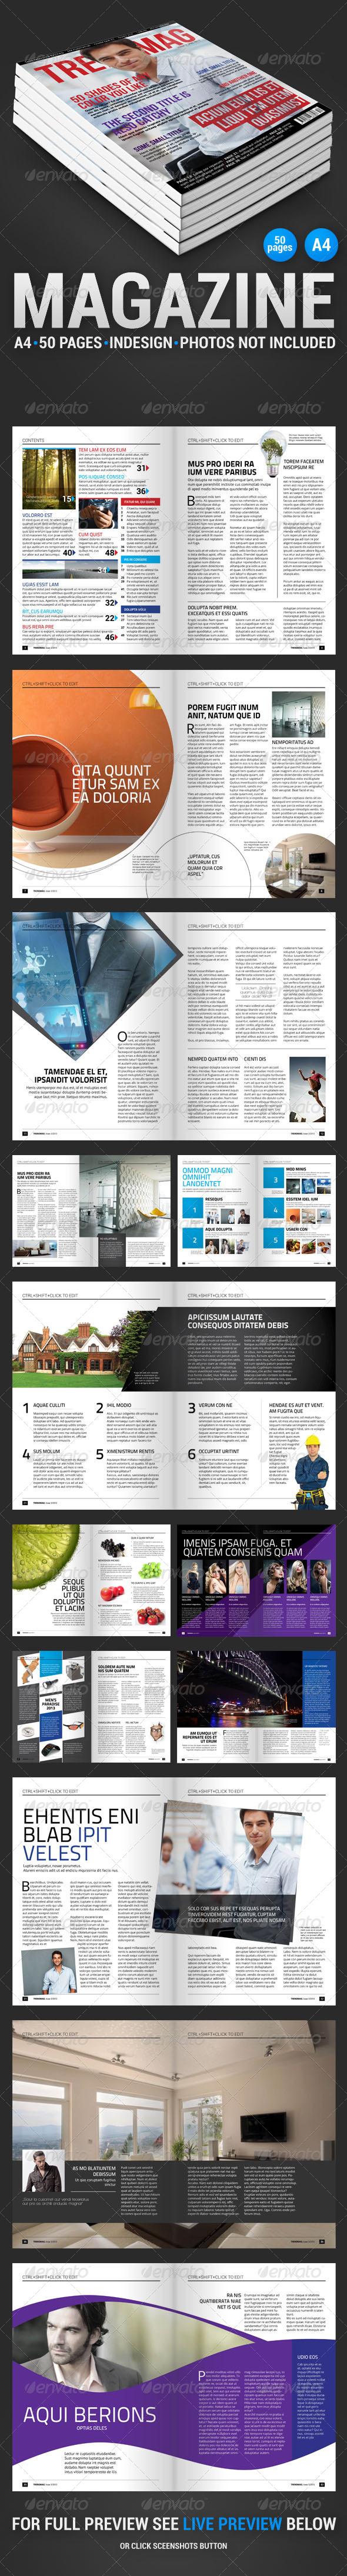 TrendMag 50 pages magazine - Magazines Print Templates